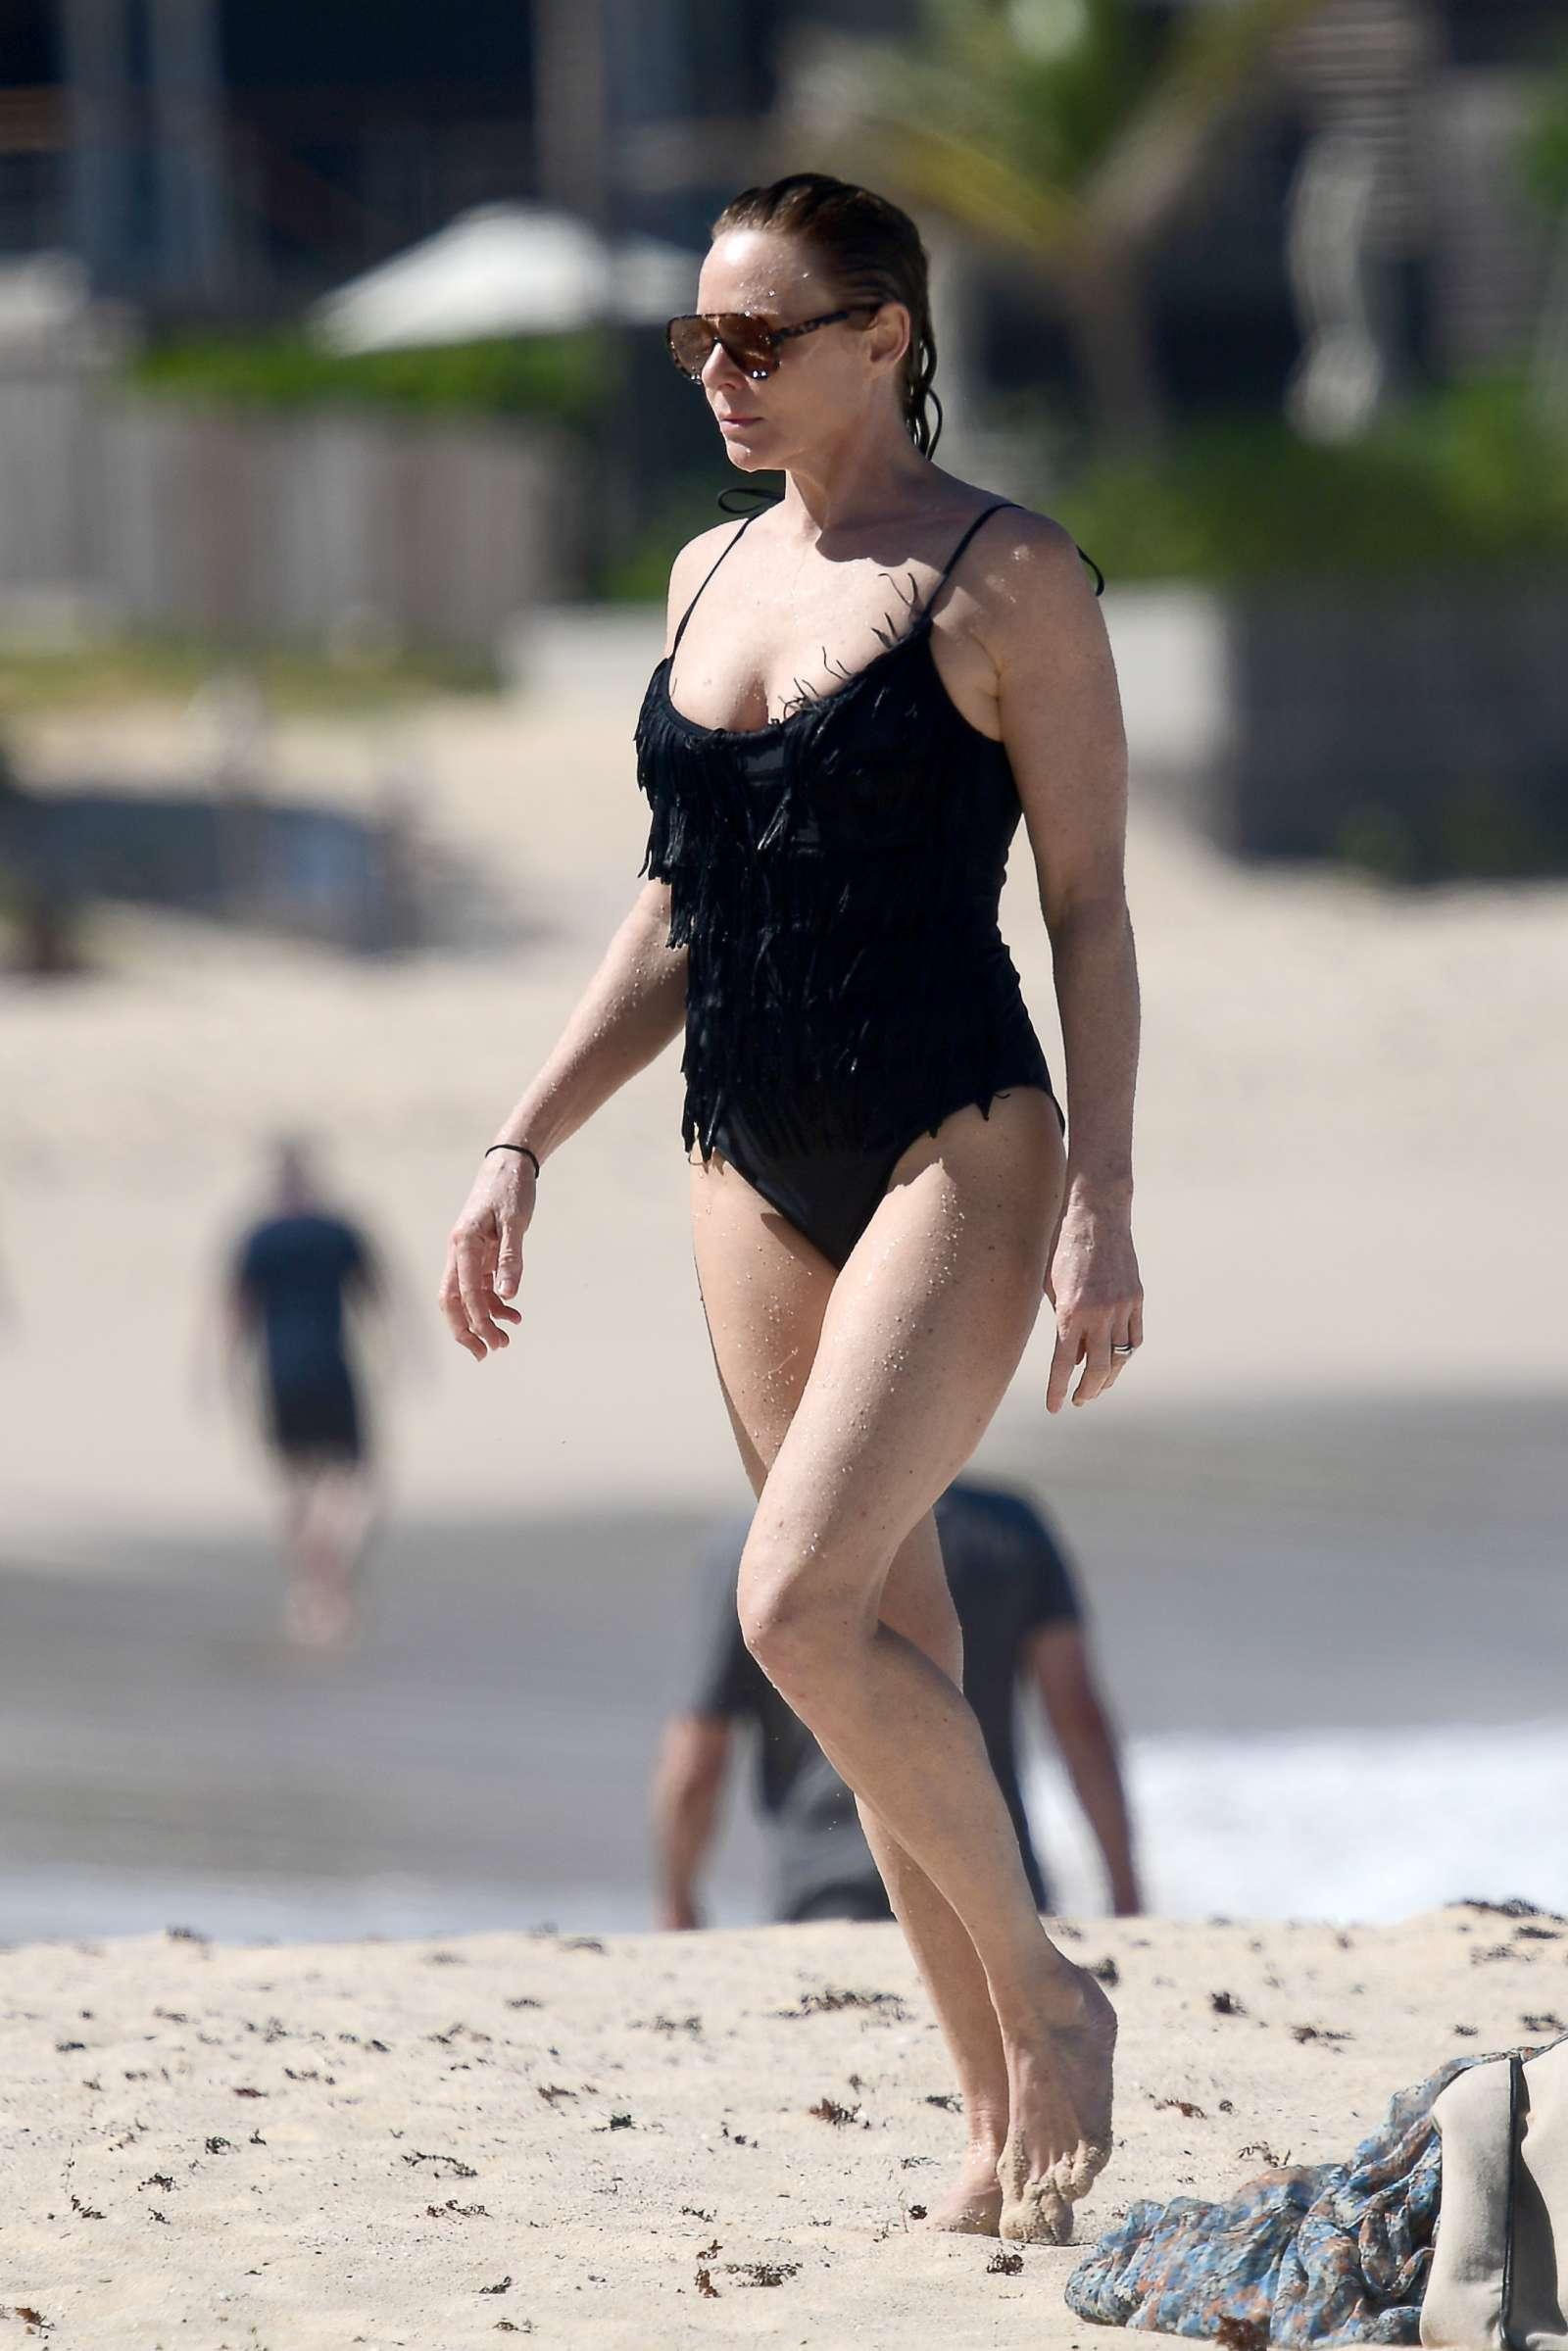 Stella McCartney 2019 : Stella McCartney in Black Swimsuit 2019 -02